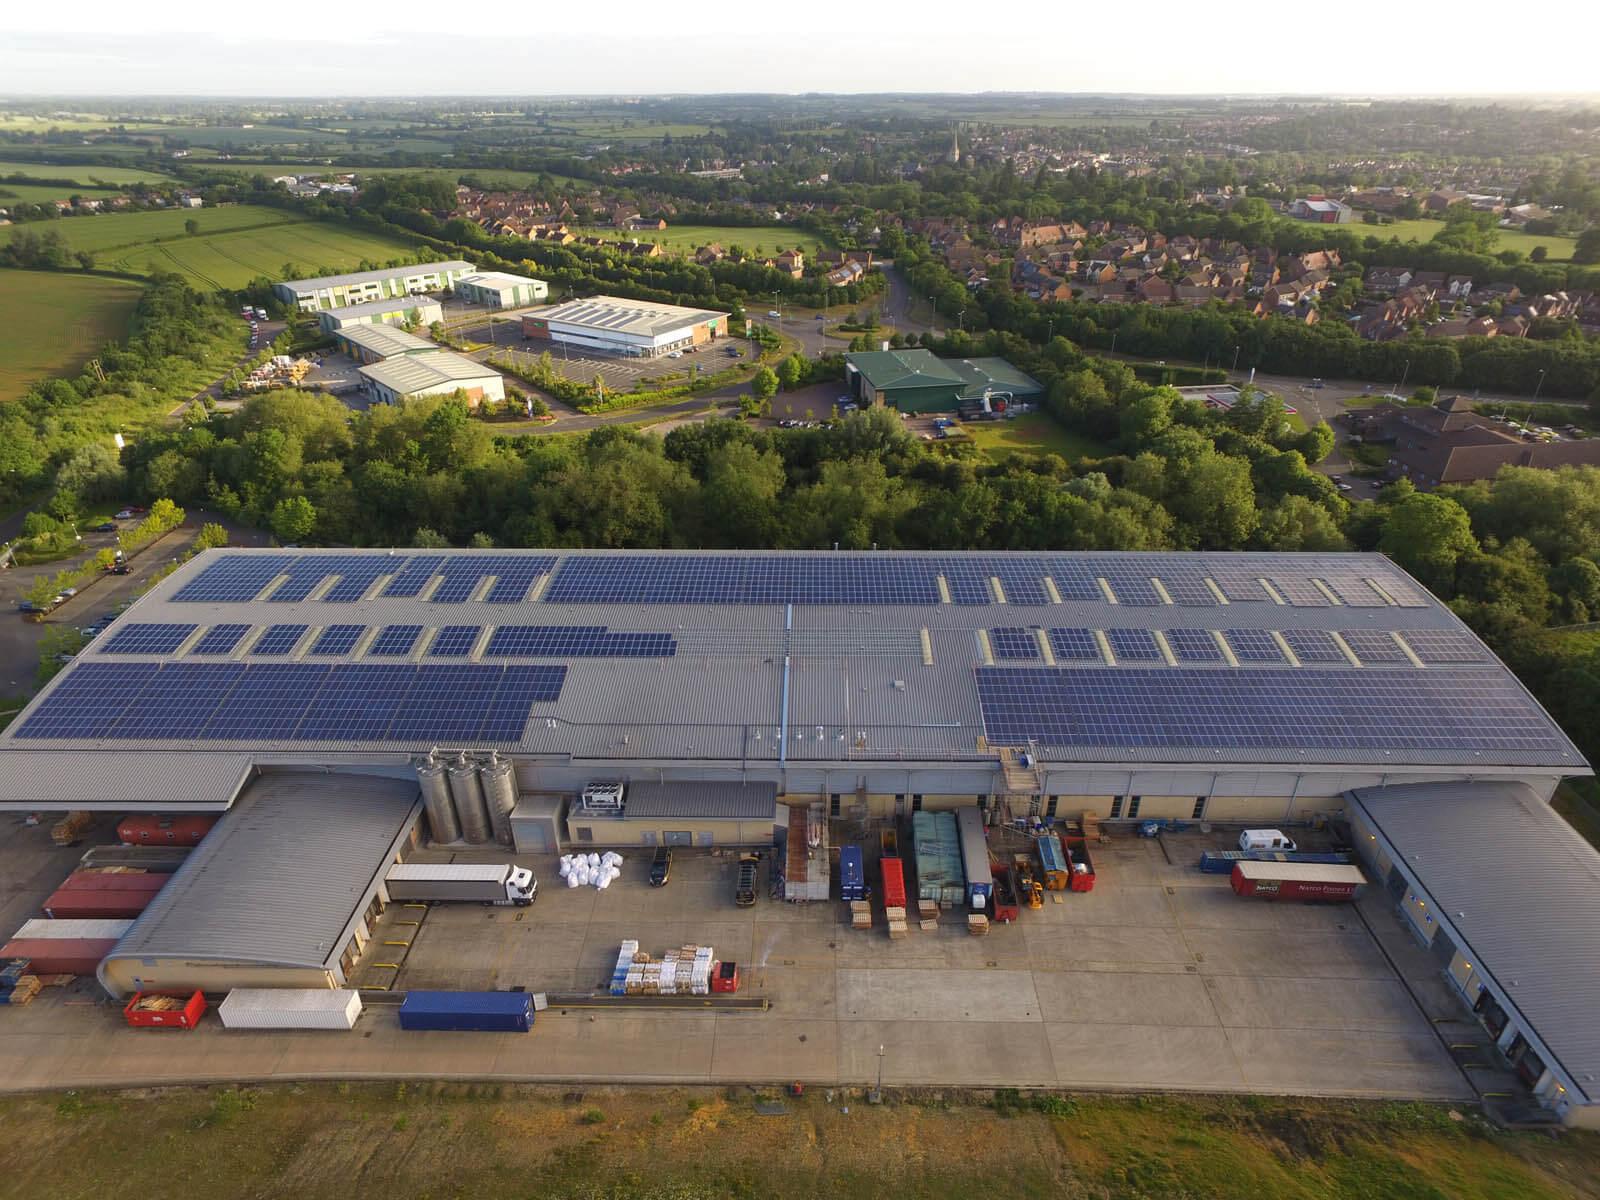 Natco Foods Buckingham Cleanearth Energy